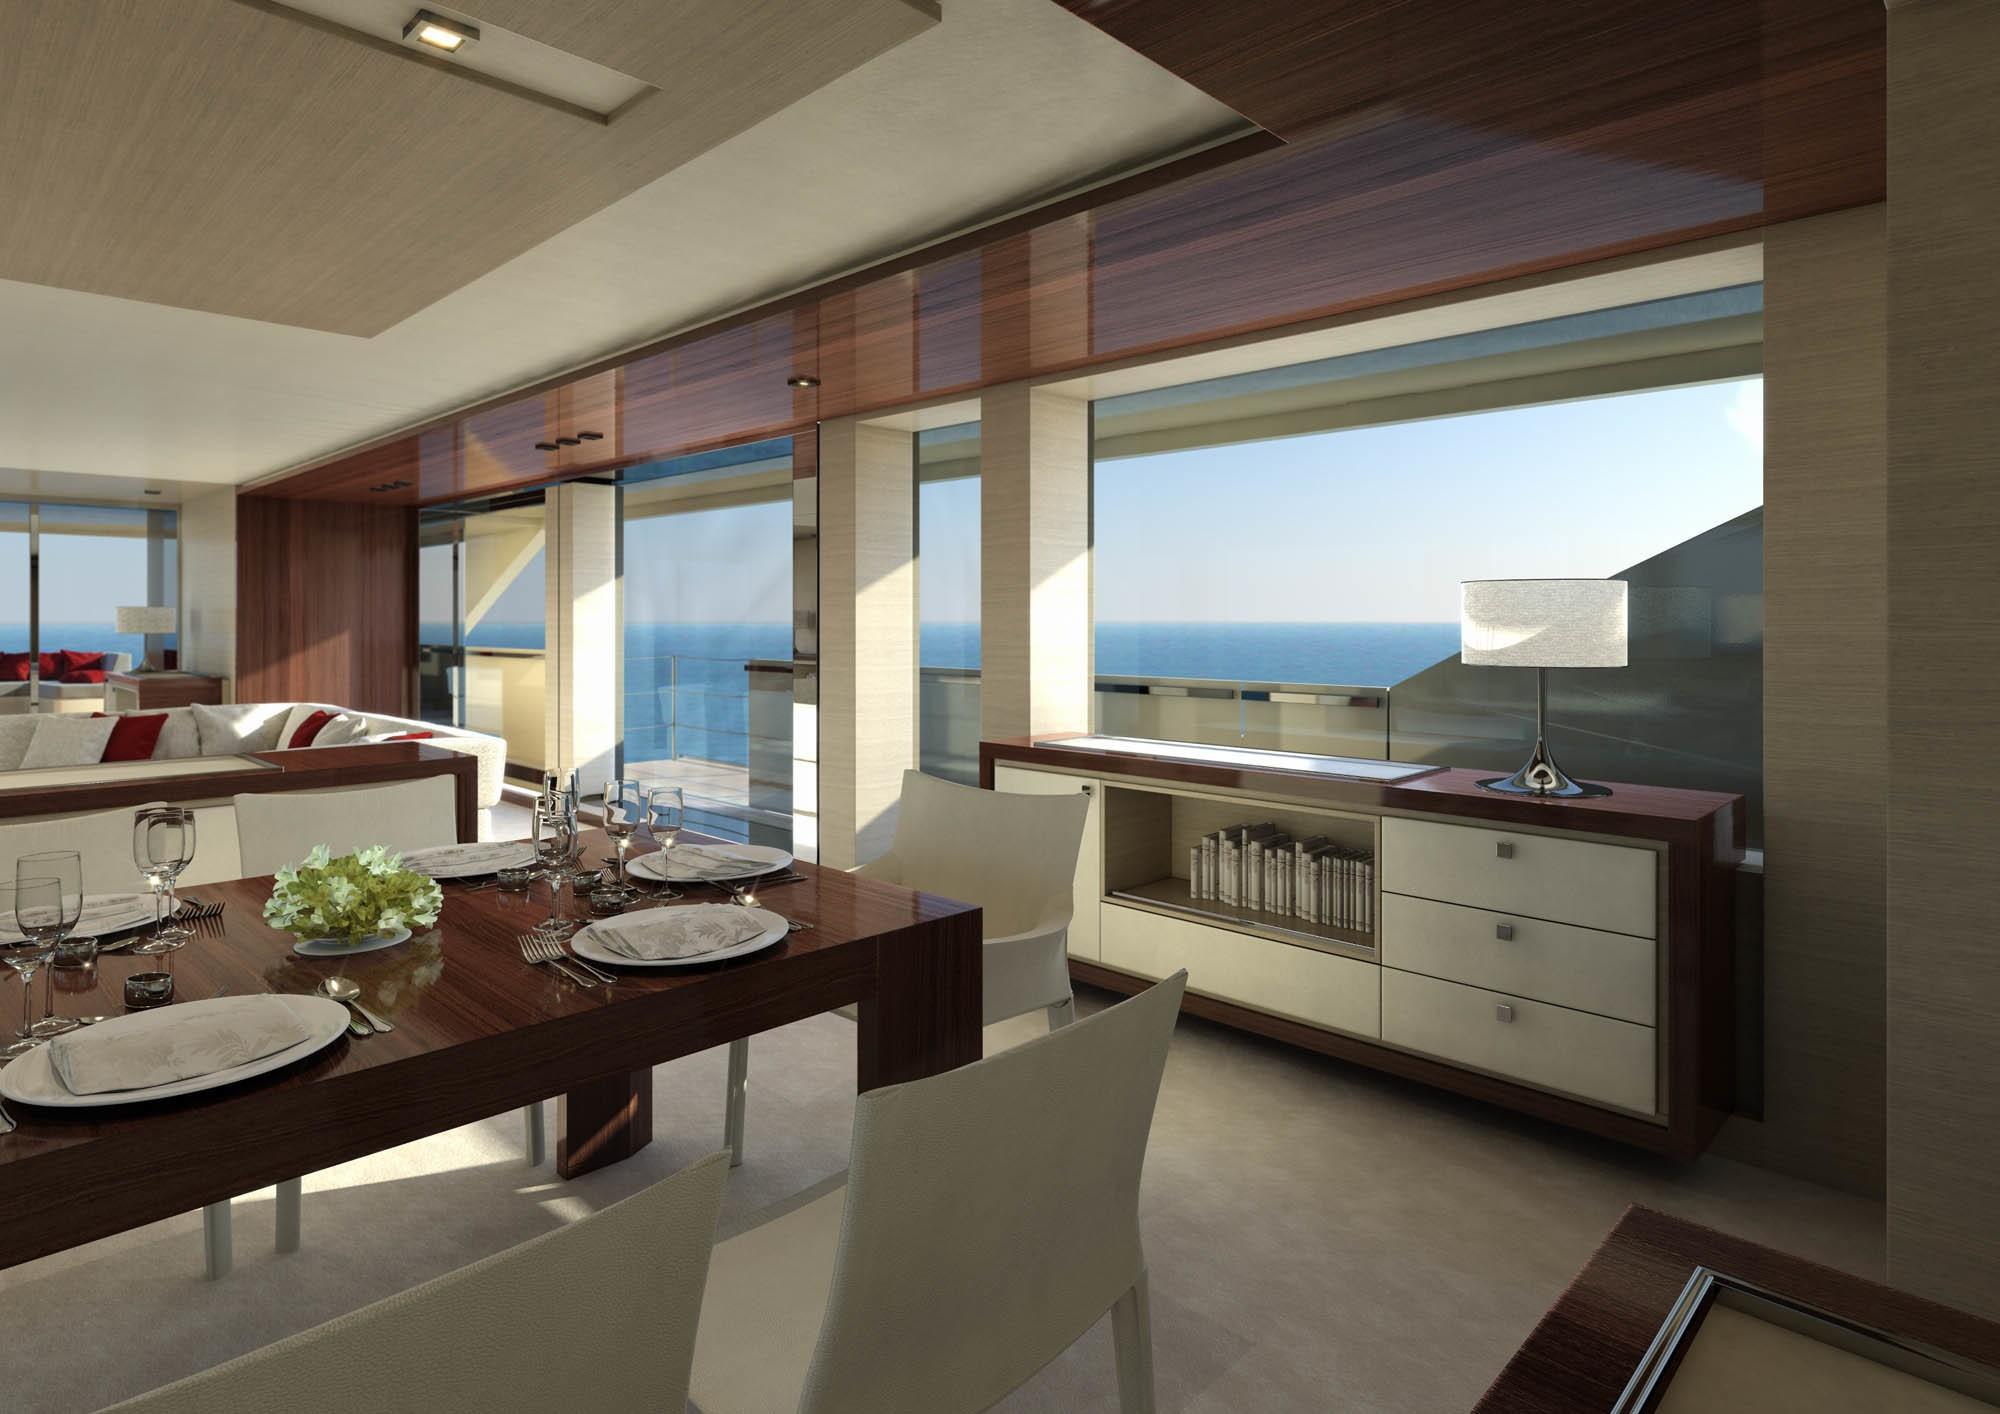 yacht serenity a mondomarine sf40 superyacht